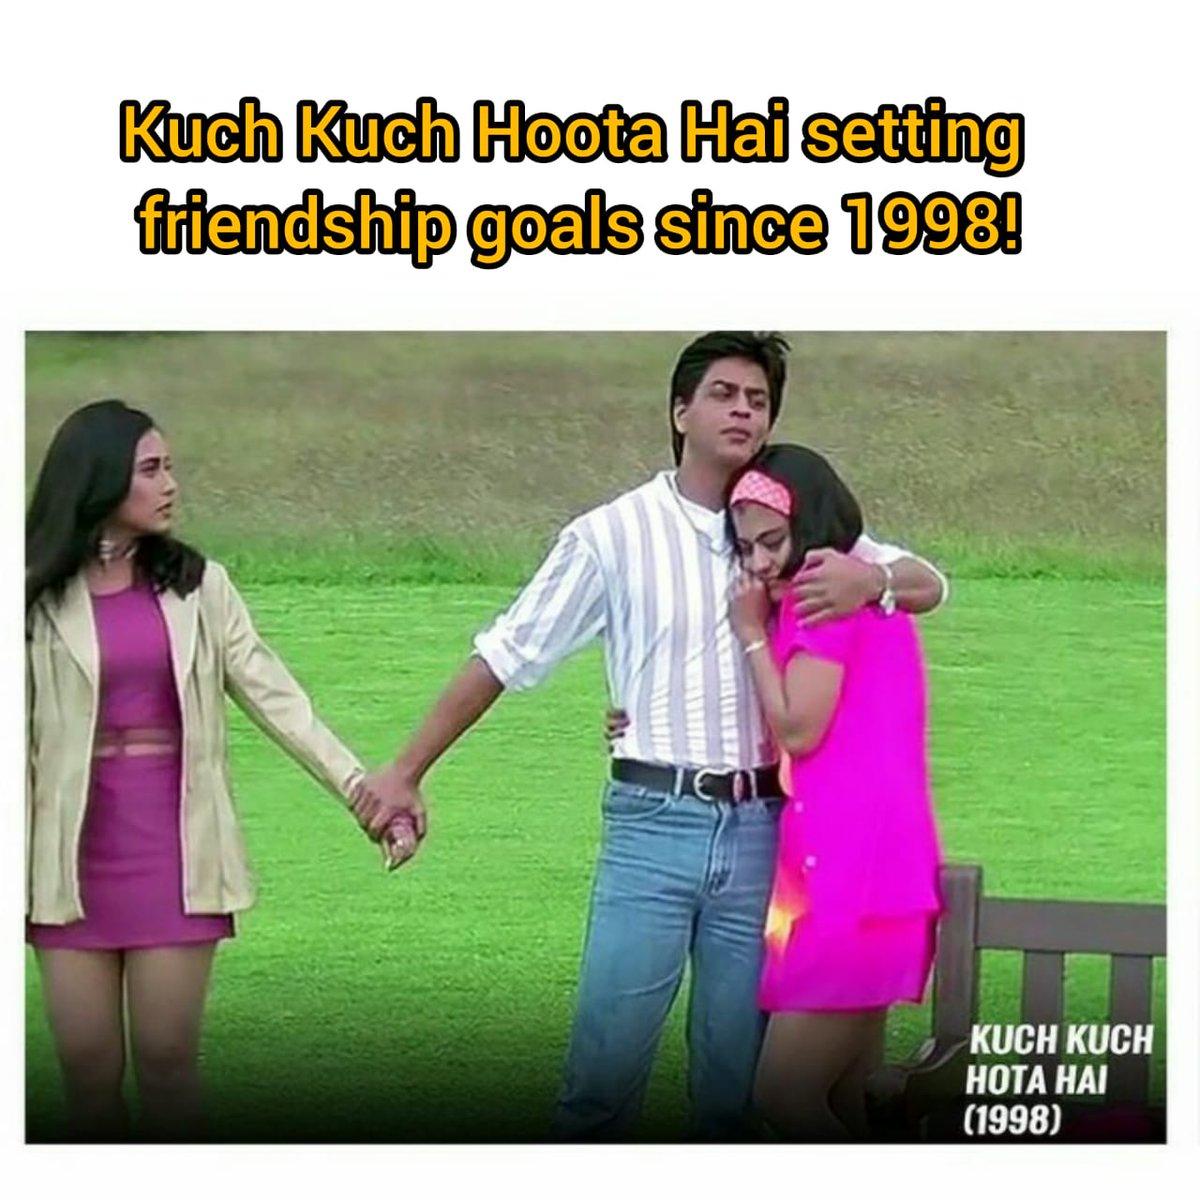 Kuch kuch hota hai since 1998!🤪 #KaranJohar #DharmaProductions #Bollywood #KuchKuchHotaHai #BestMovies #BollywoodMovies #Entertainment #BestFilmMaker #BestDirector #BestMovie #Director https://t.co/vDVwywDUN7